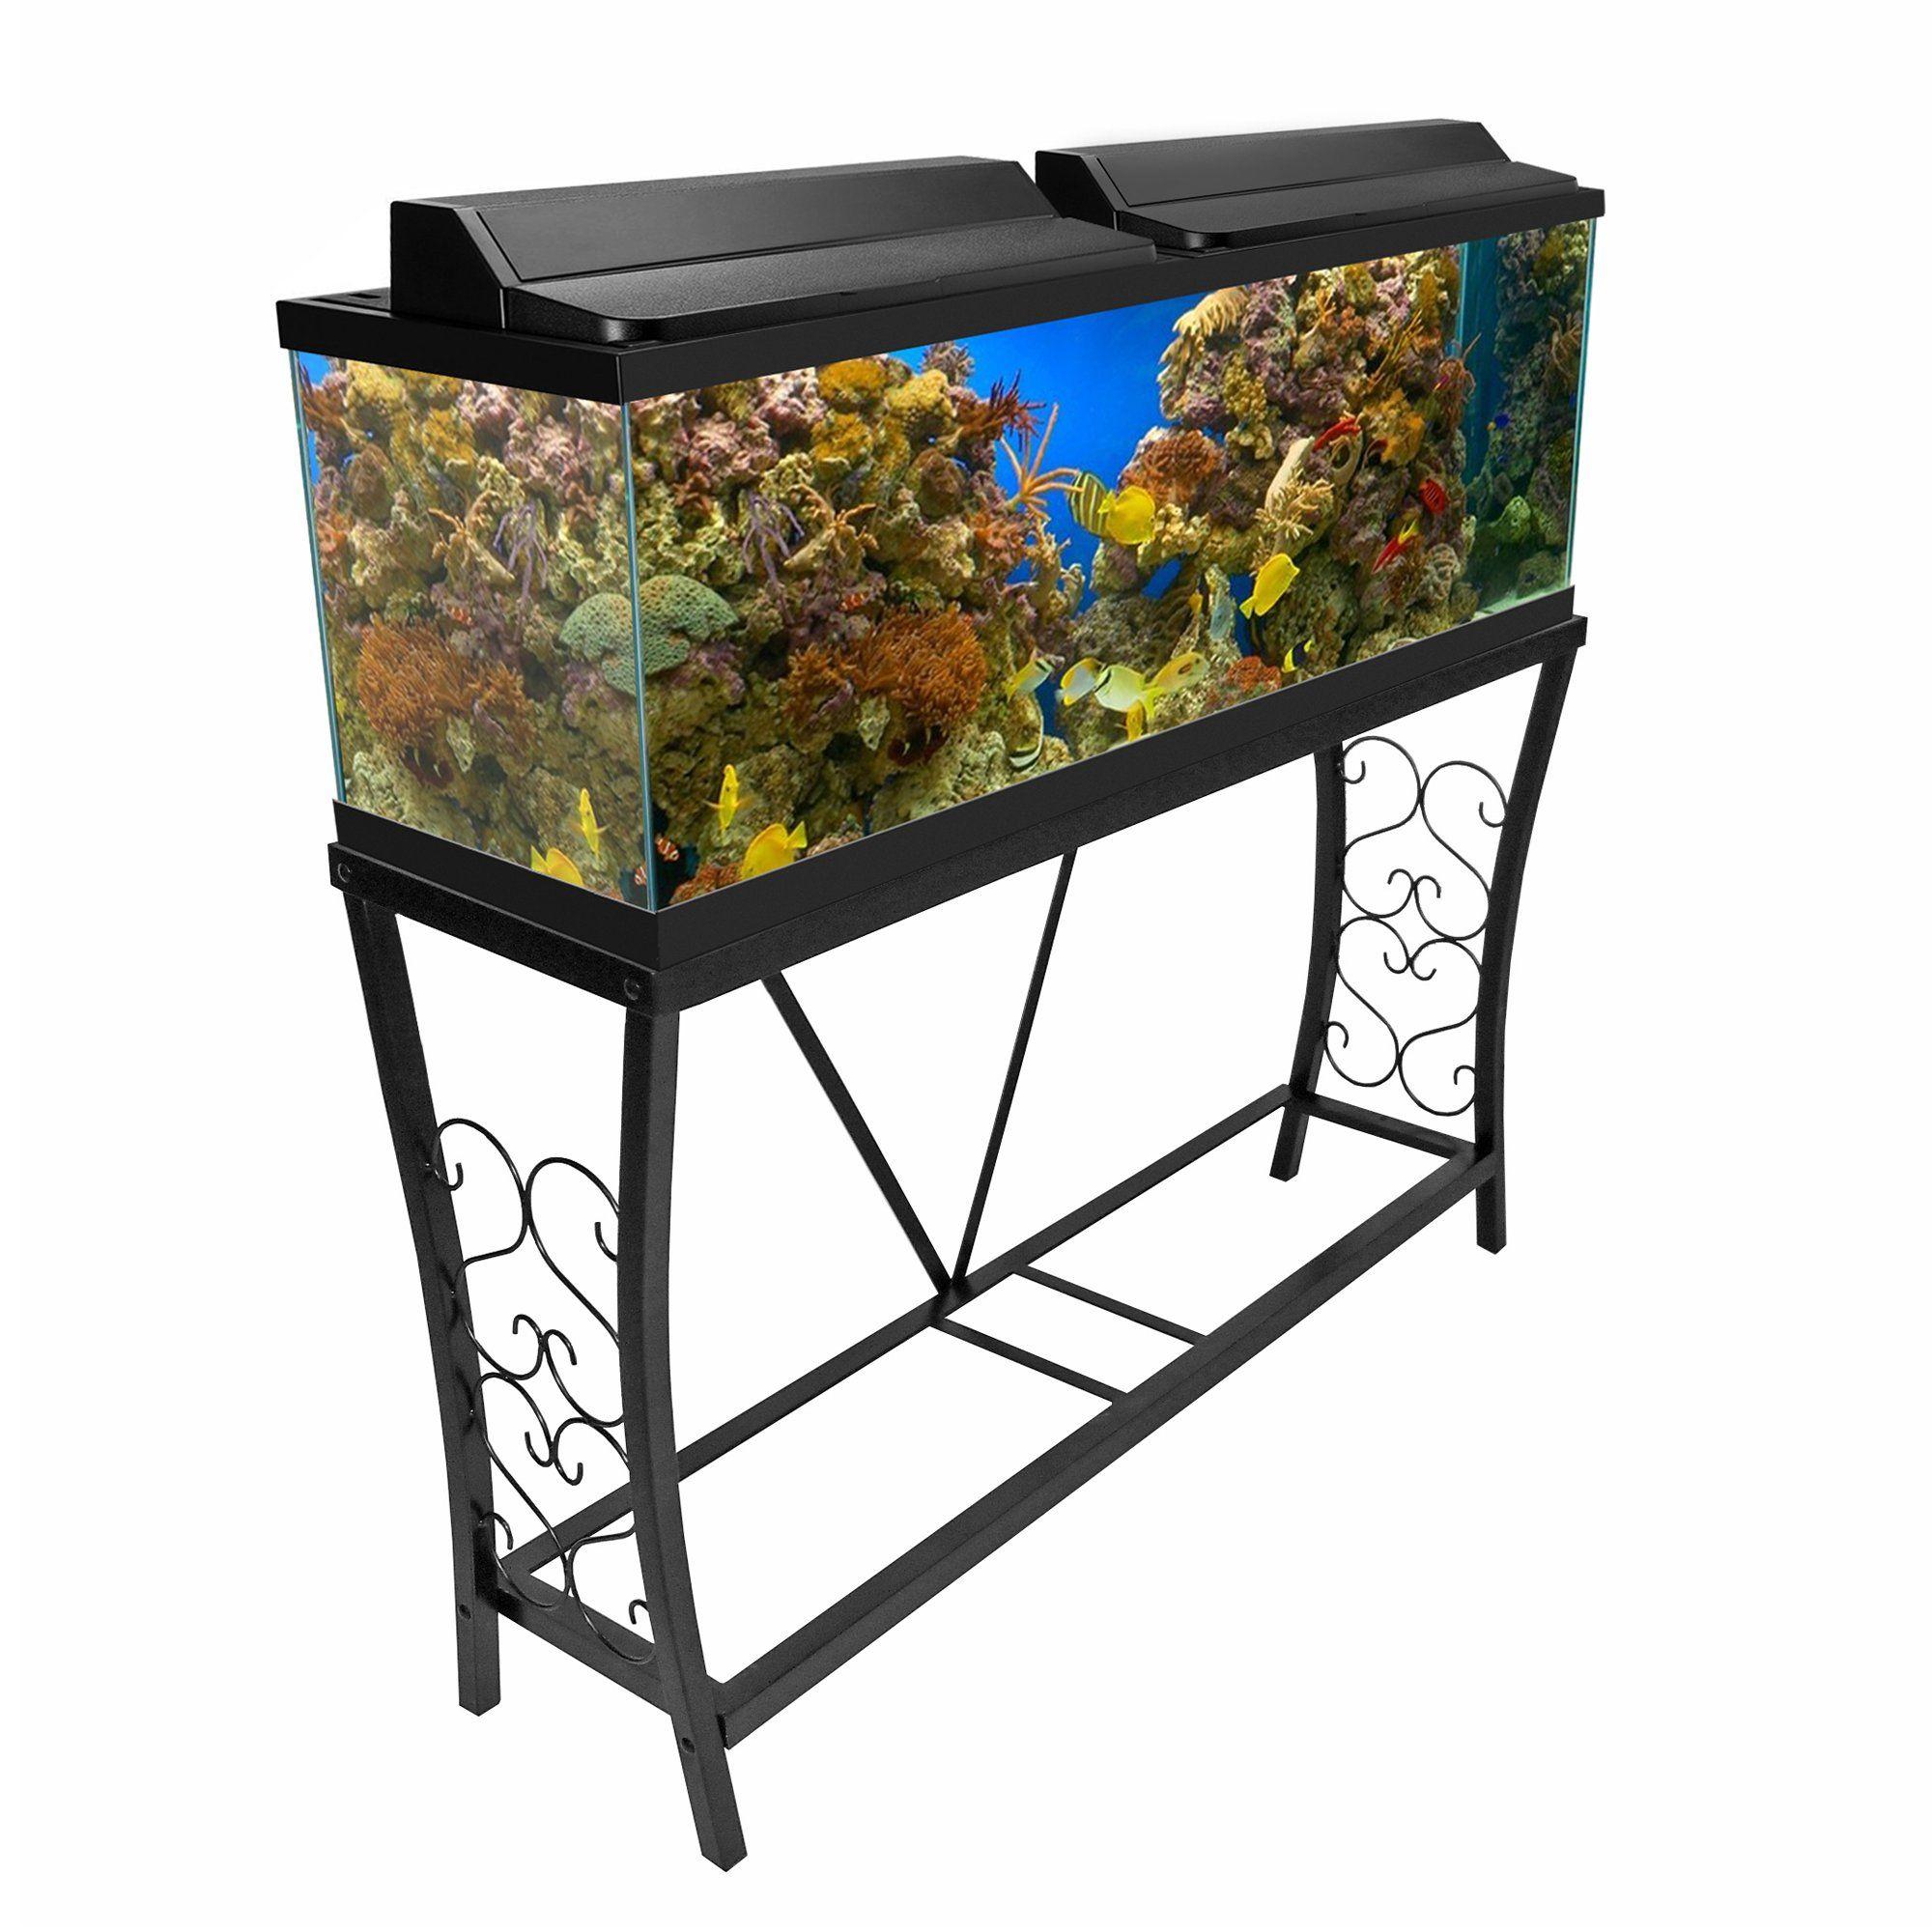 Aquatic Fundamentals Black Scroll Aquarium Stand For 55 Gallon Aquariums Petco Fish Tank Stand Aquarium Stand Tank Stand